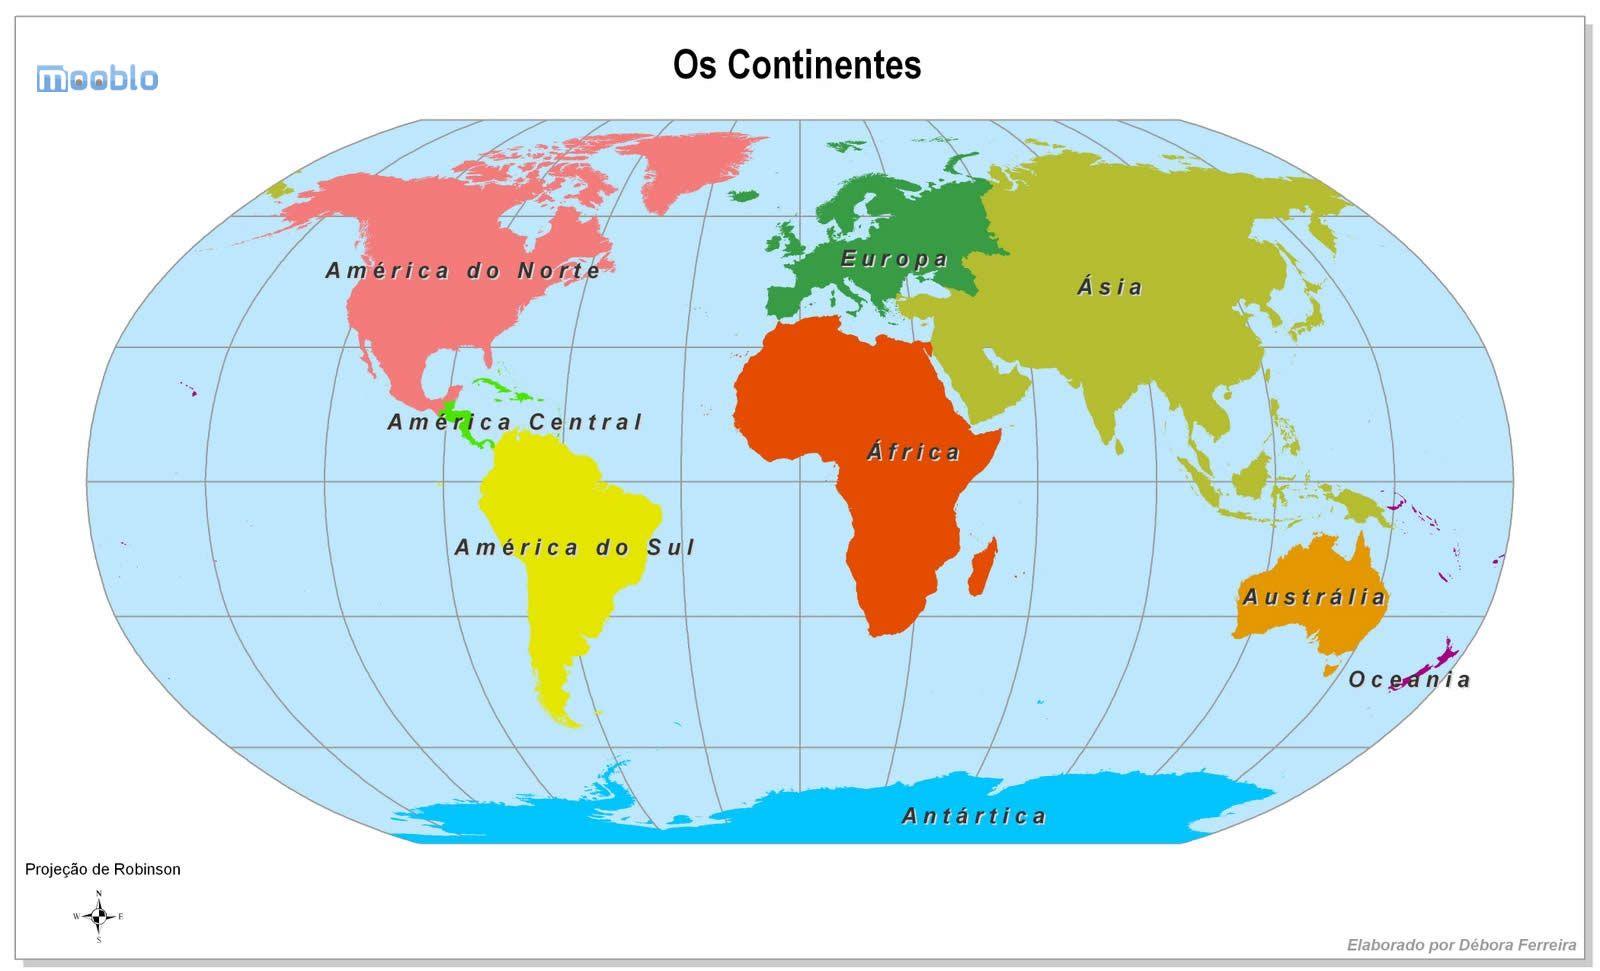 mapa mundi continentes mapa mundi continentes gigante. (1600×971)   idéias   Pinterest mapa mundi continentes